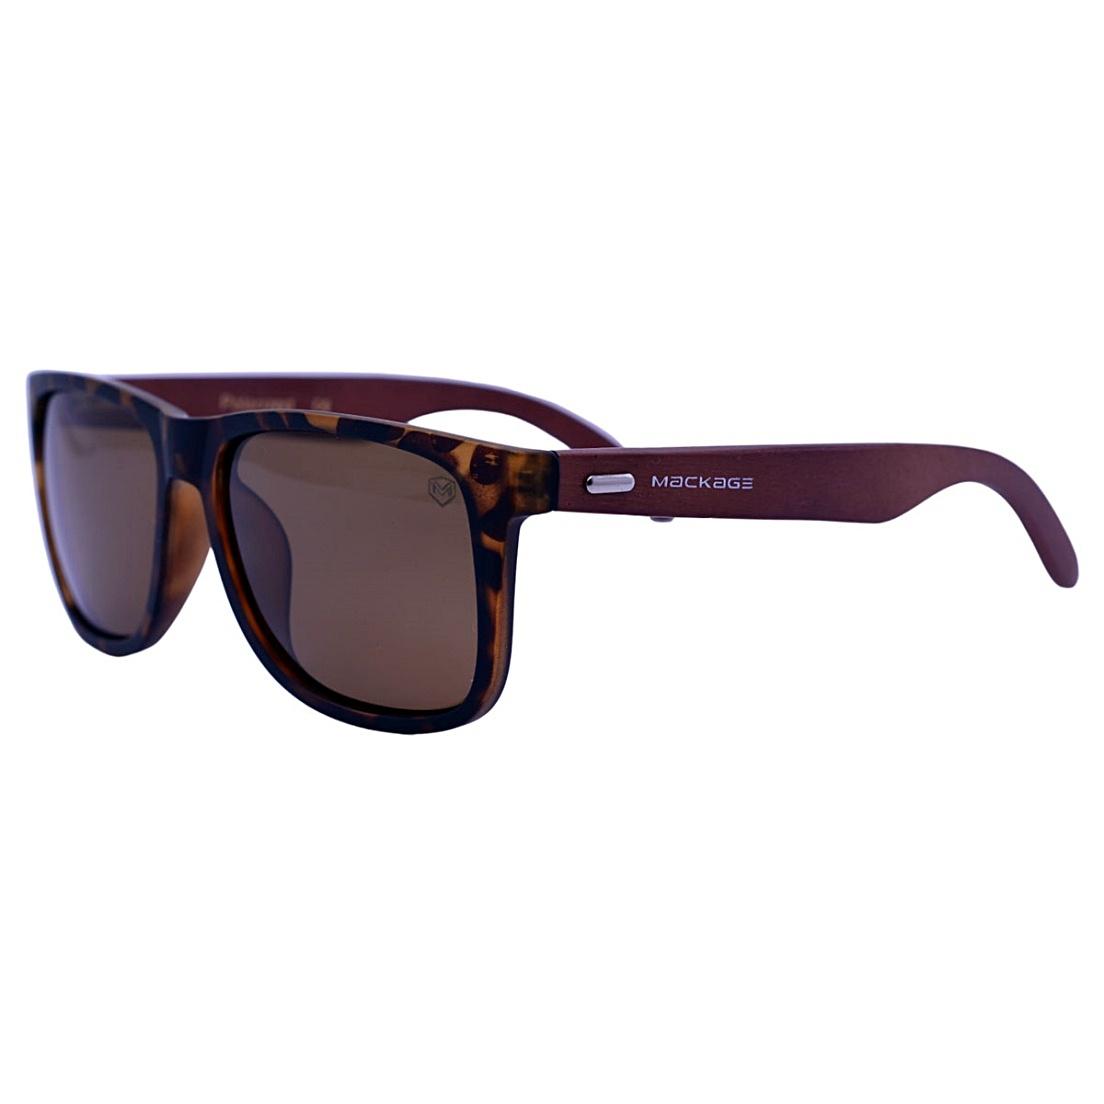 Óculos De Sol Mackage Unissex Wayfarer Madeira Polarizado - Tartaruga